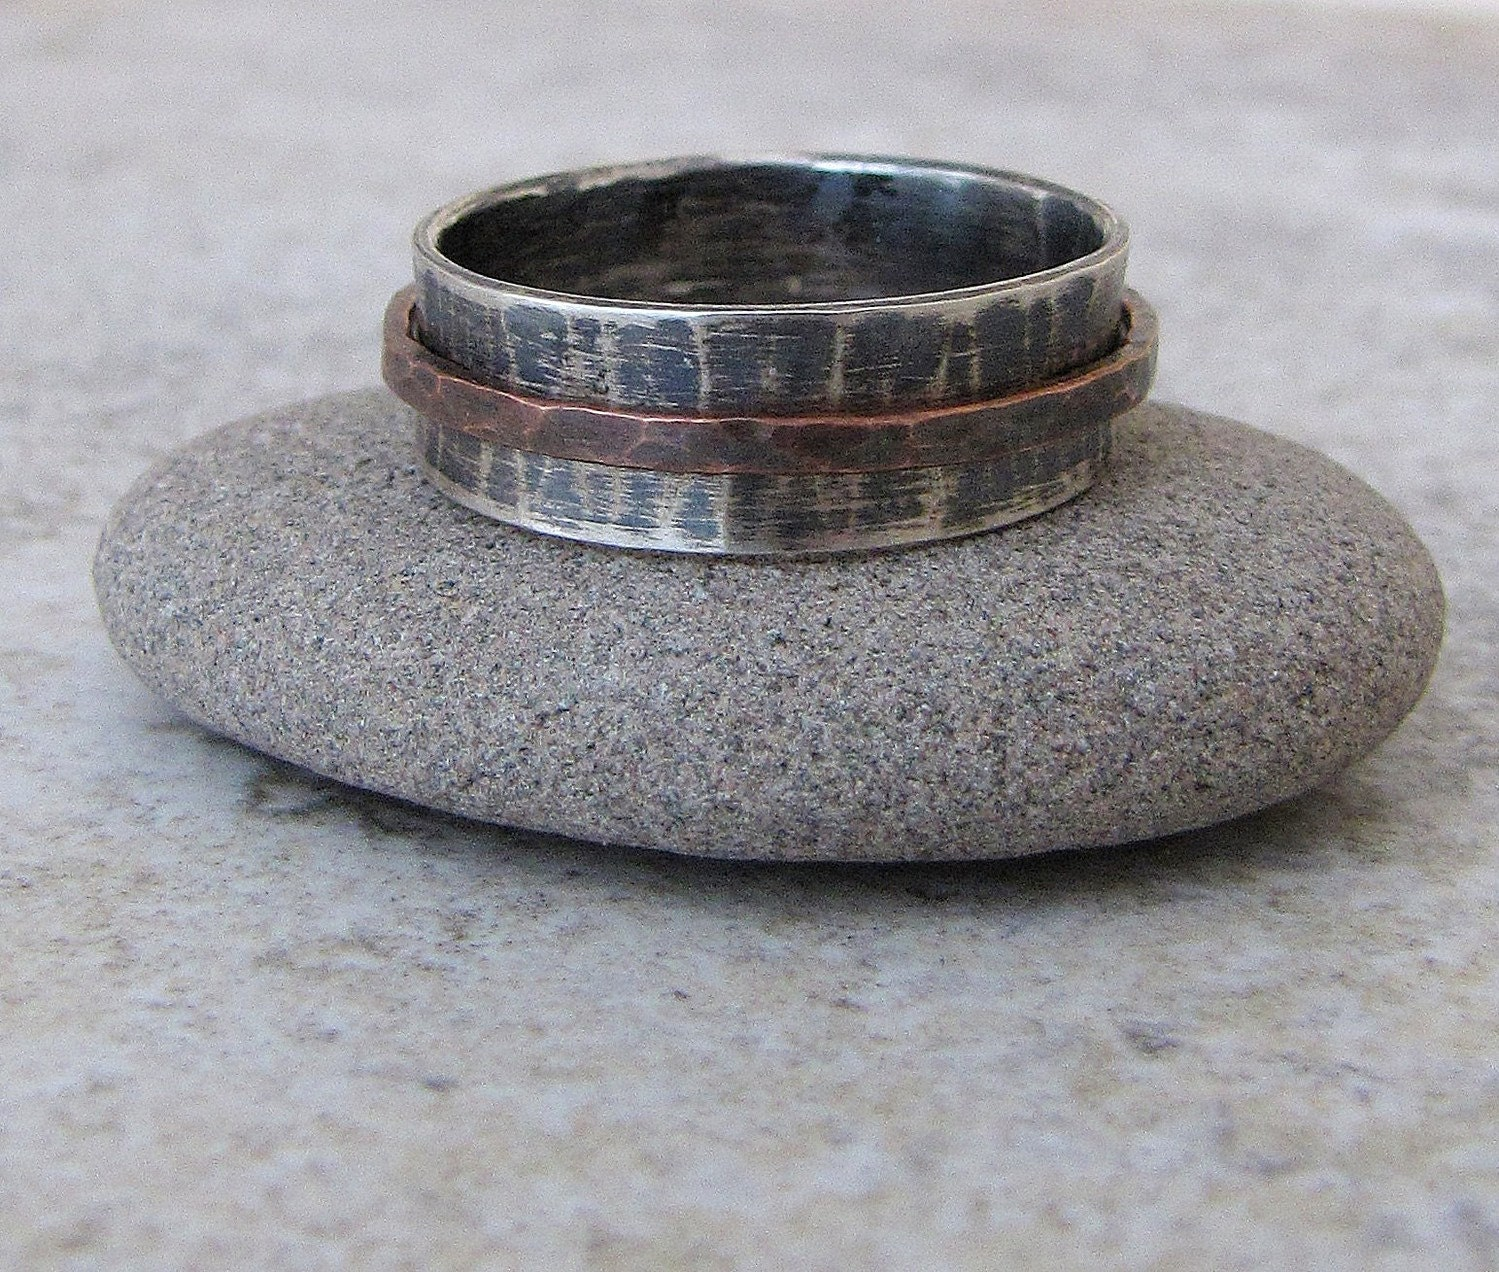 mens spinner ring tungsten hammered wedding band Mens Wedding Band Silver Copper Spinner Ring Hammered Wedding Ring Rustic Engraved RUSH